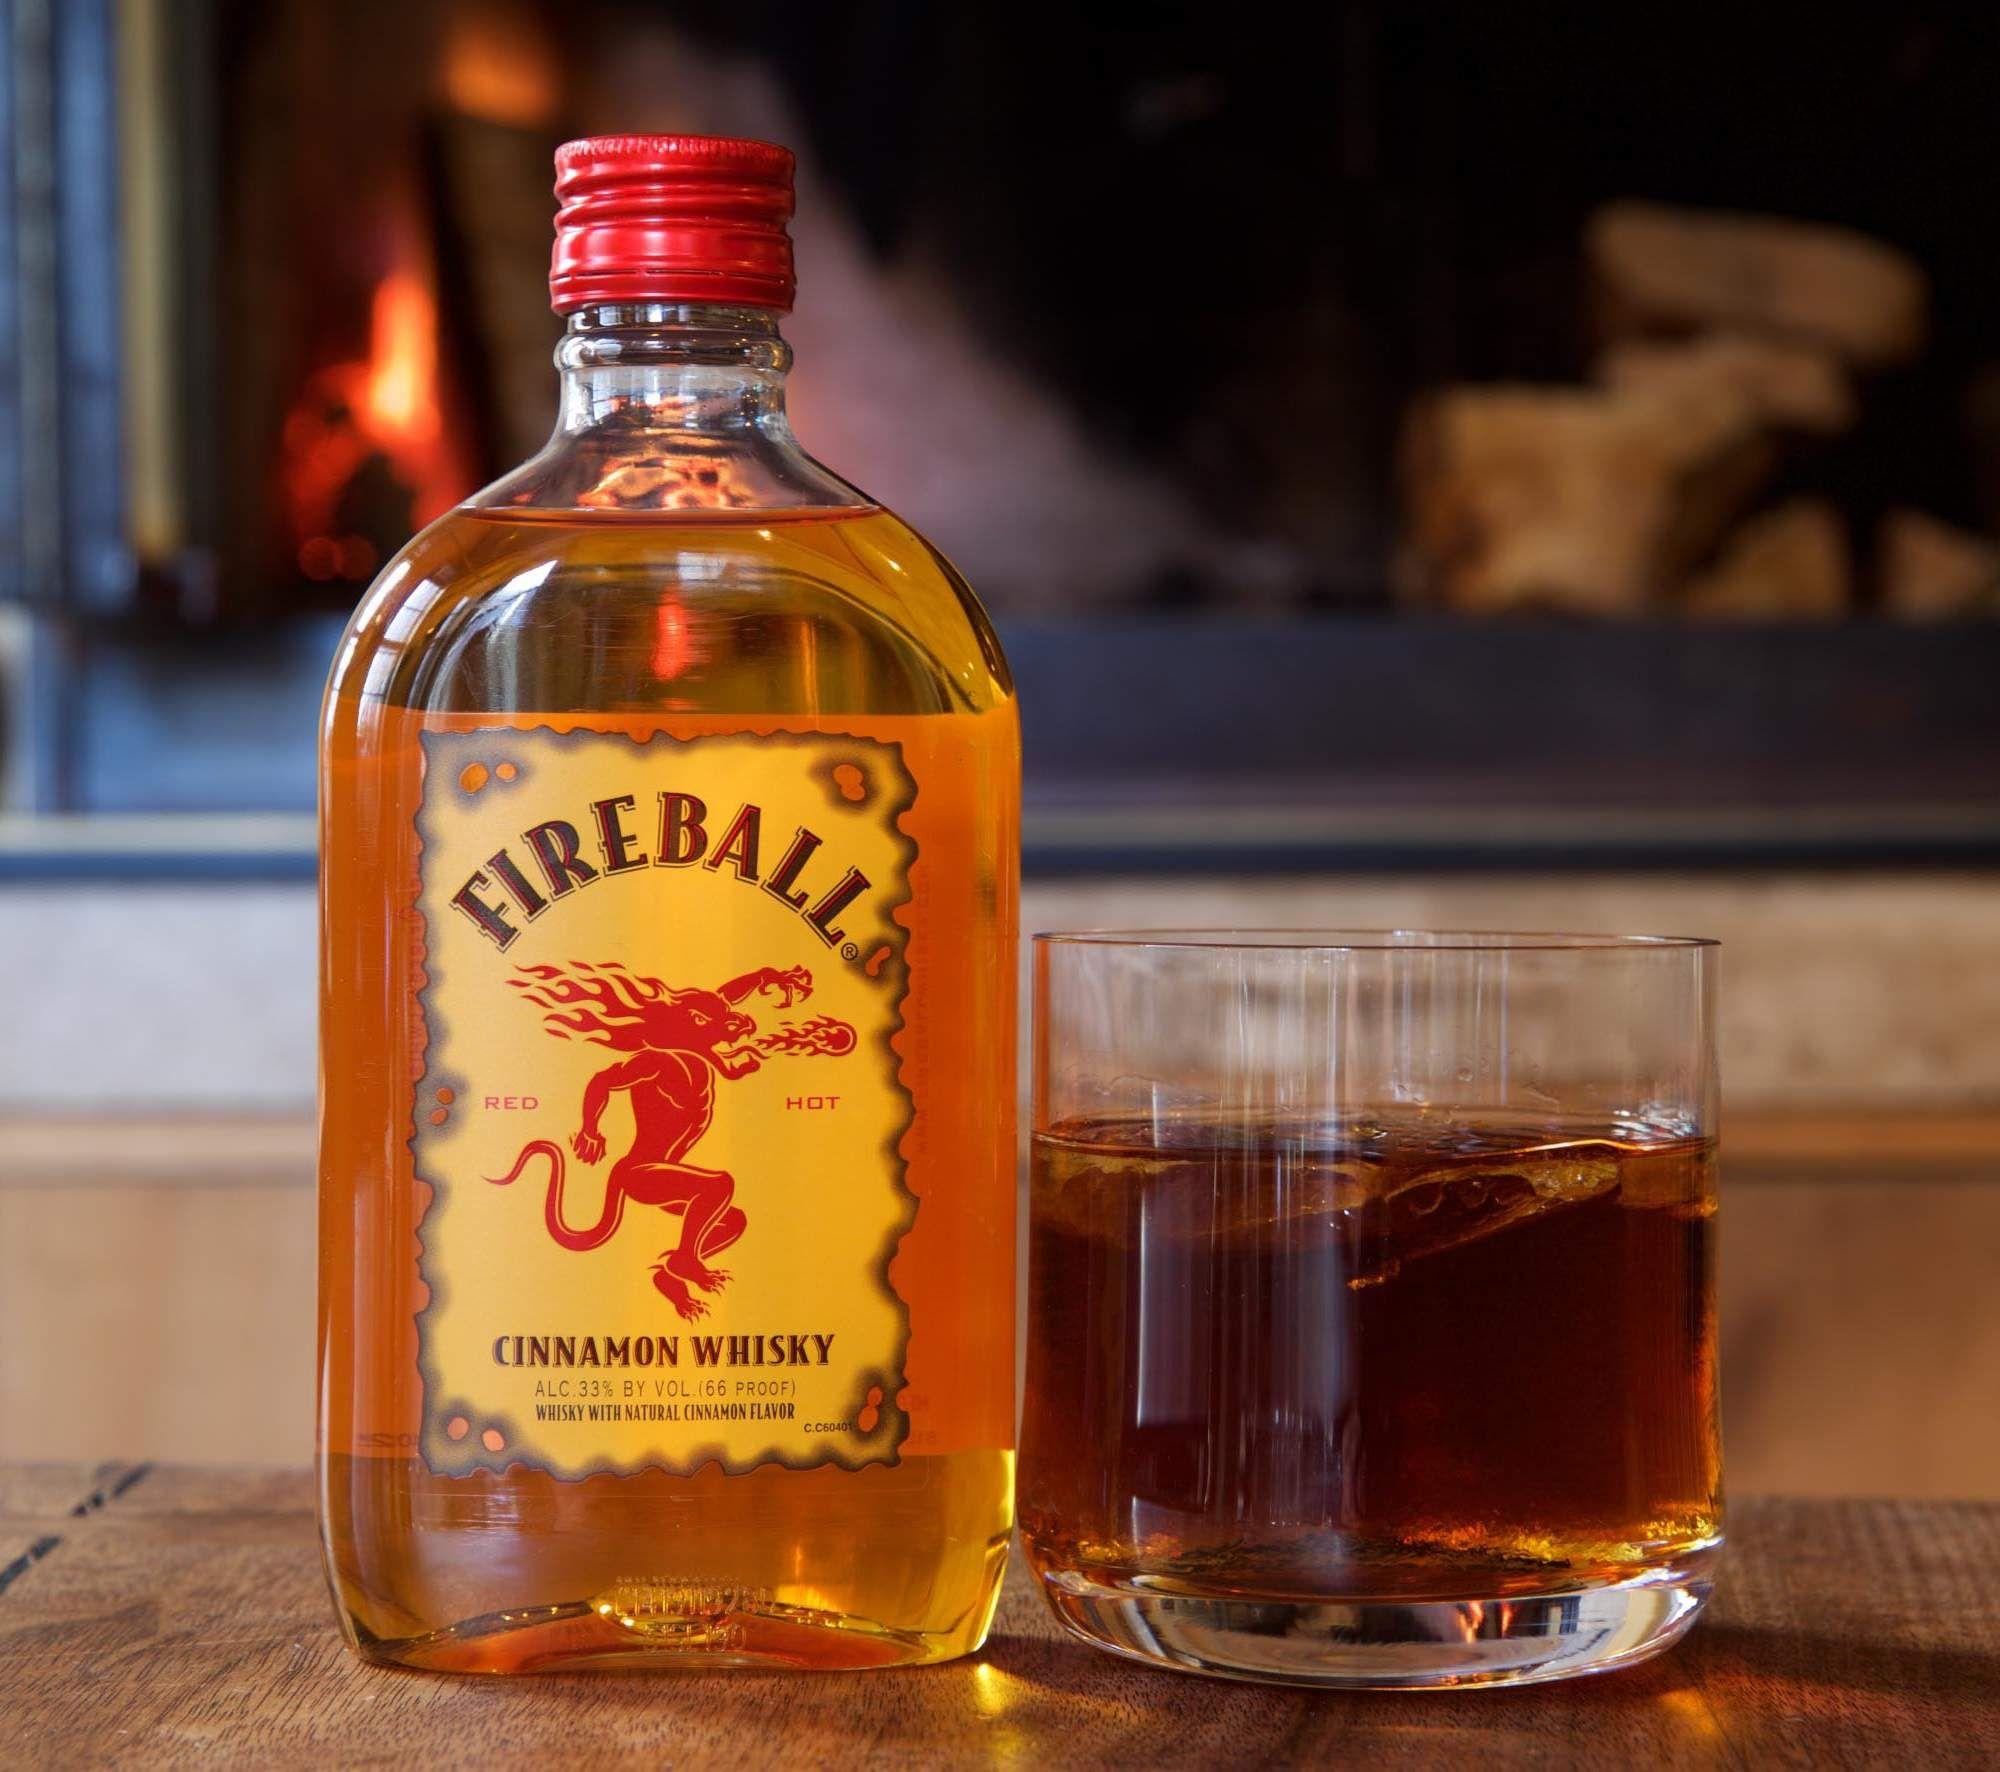 10 Next-Level Ways To Consume Fireball Whisky